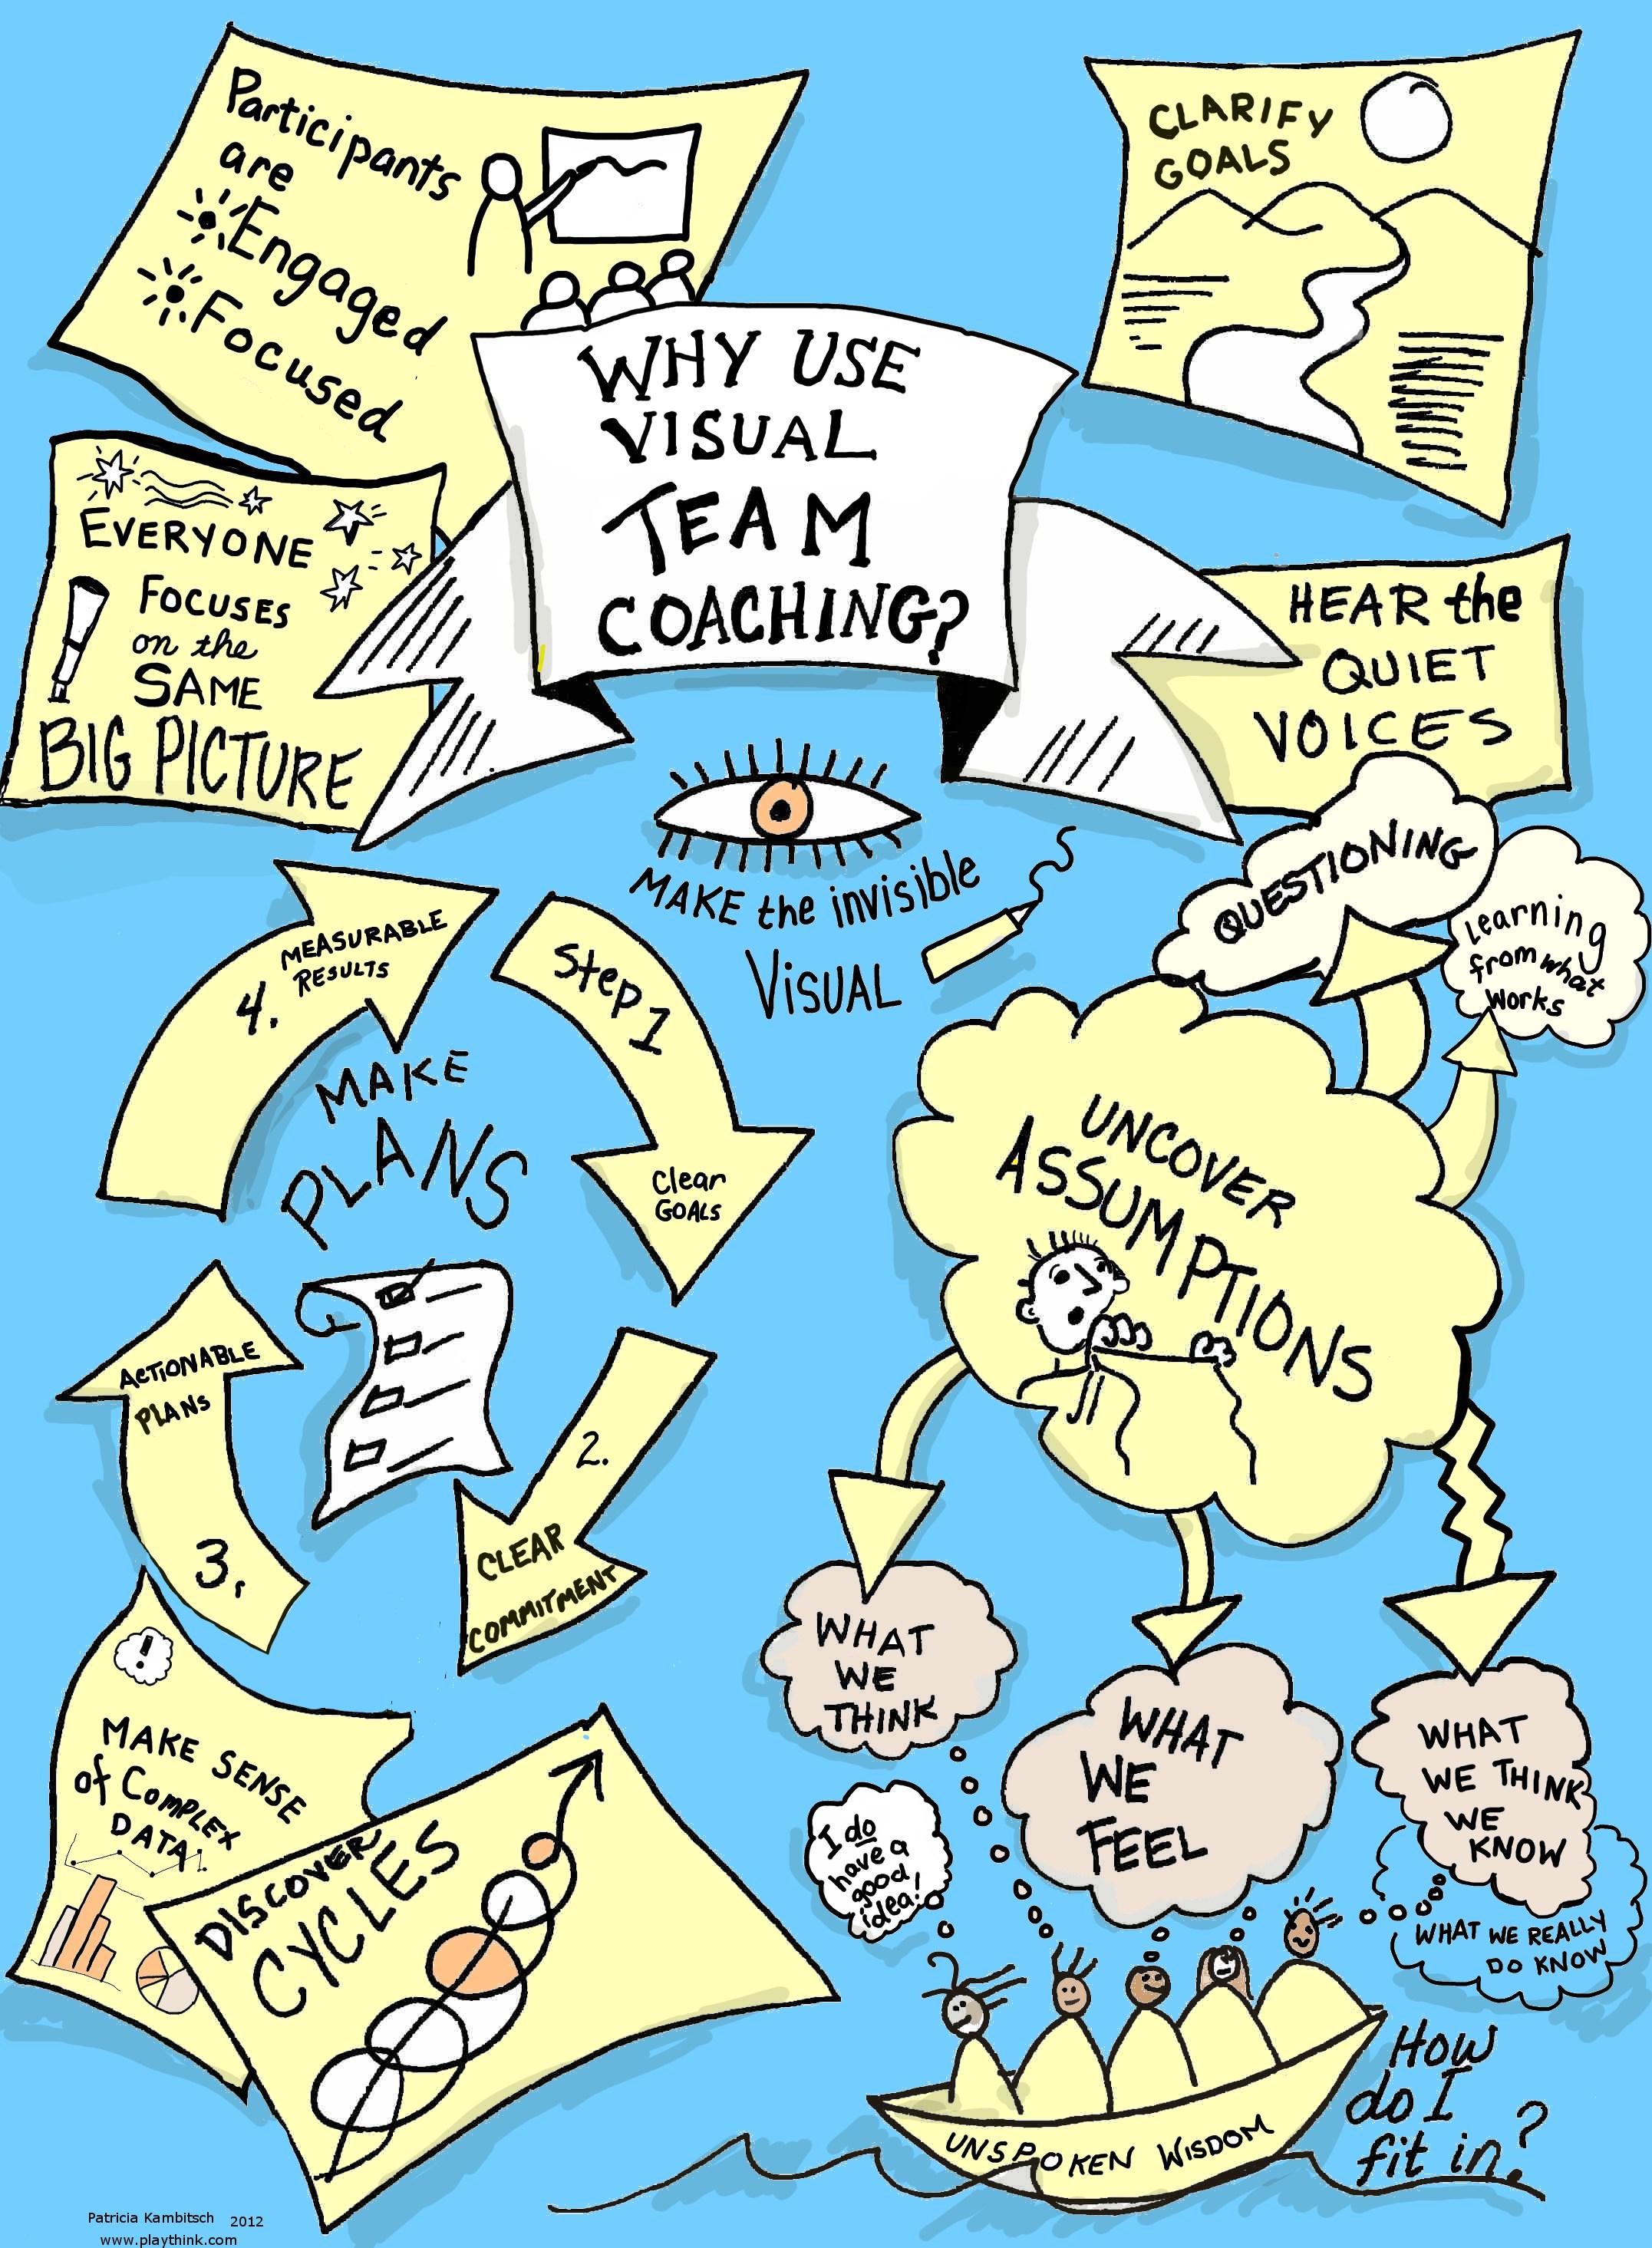 visual team coaching 2